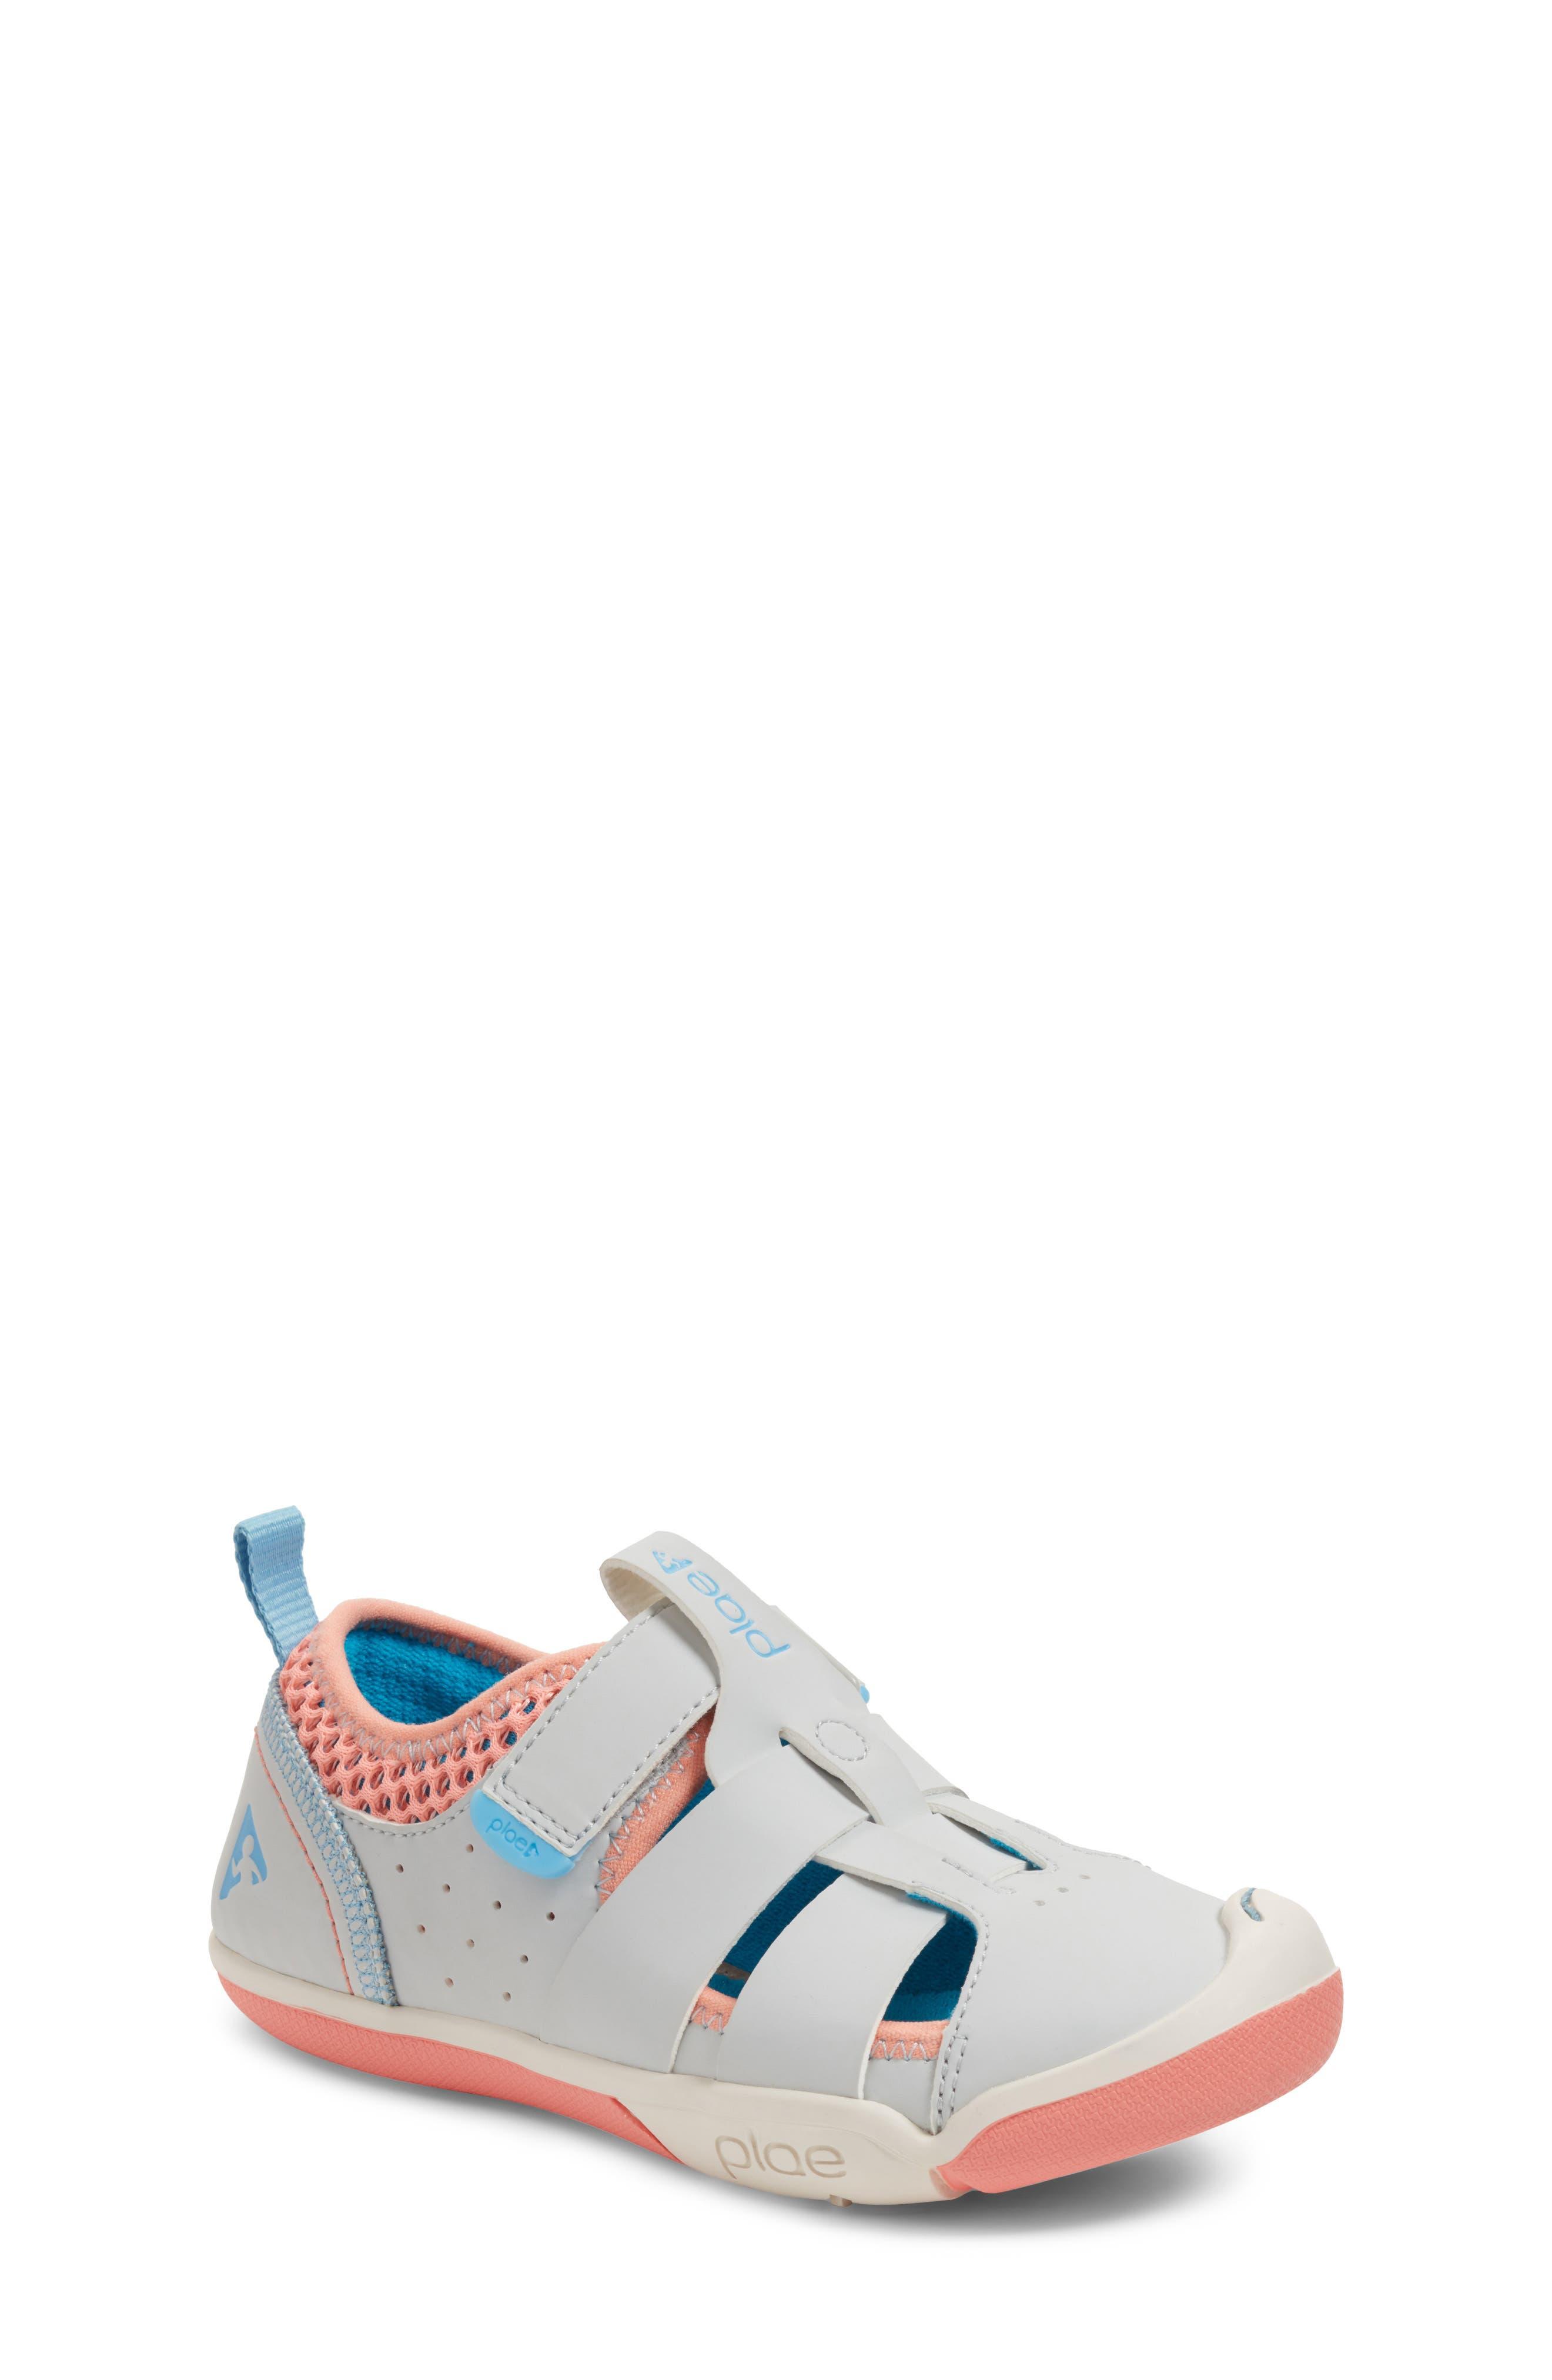 PLAE 'Sam' Customizable Sneaker (Walker, Toddler, Little Kid & Big Kid